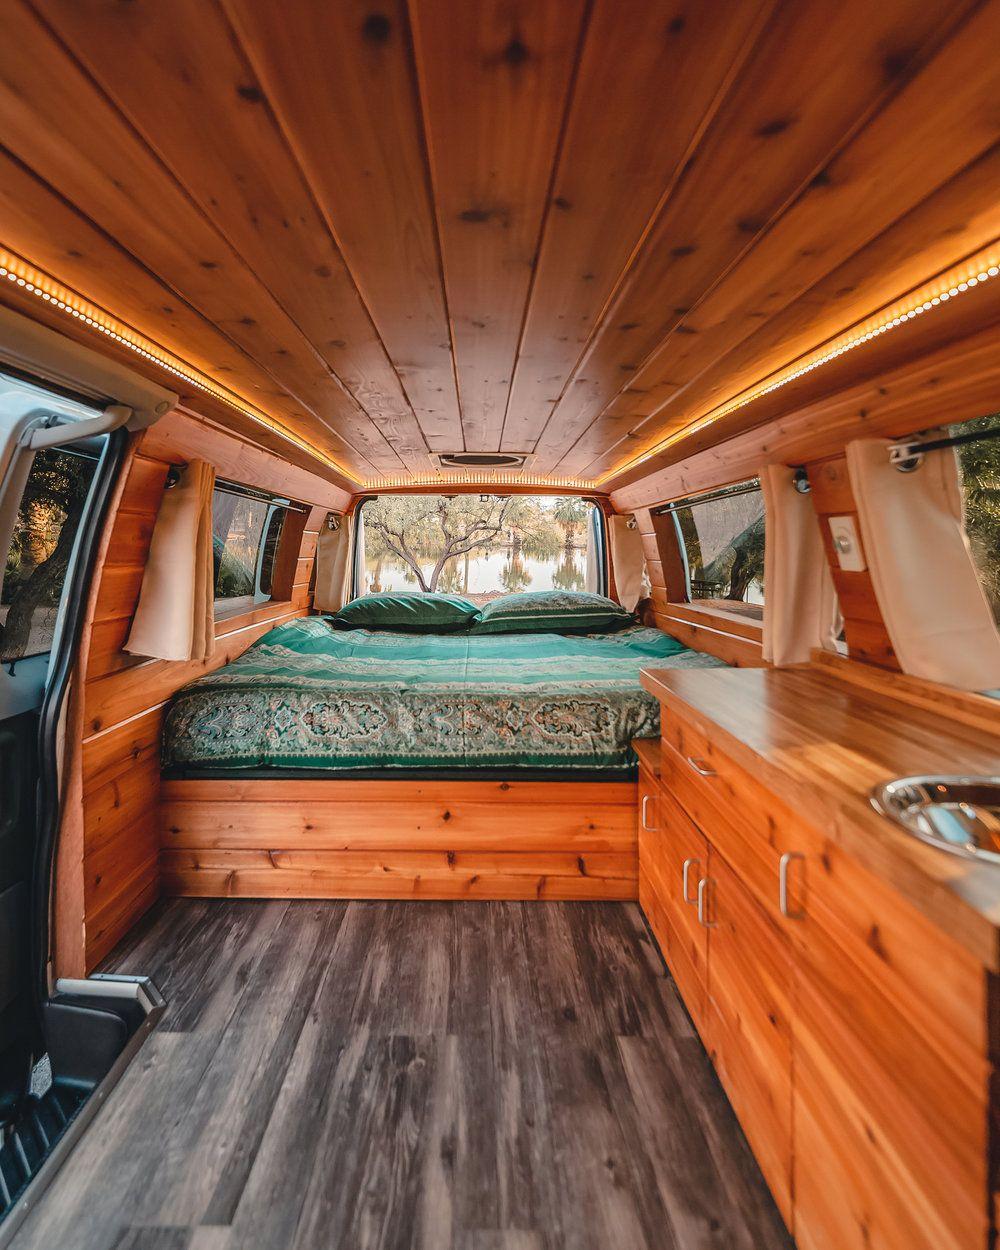 Houston — Boho Camper Vans Buy or Rent Camper Vans in